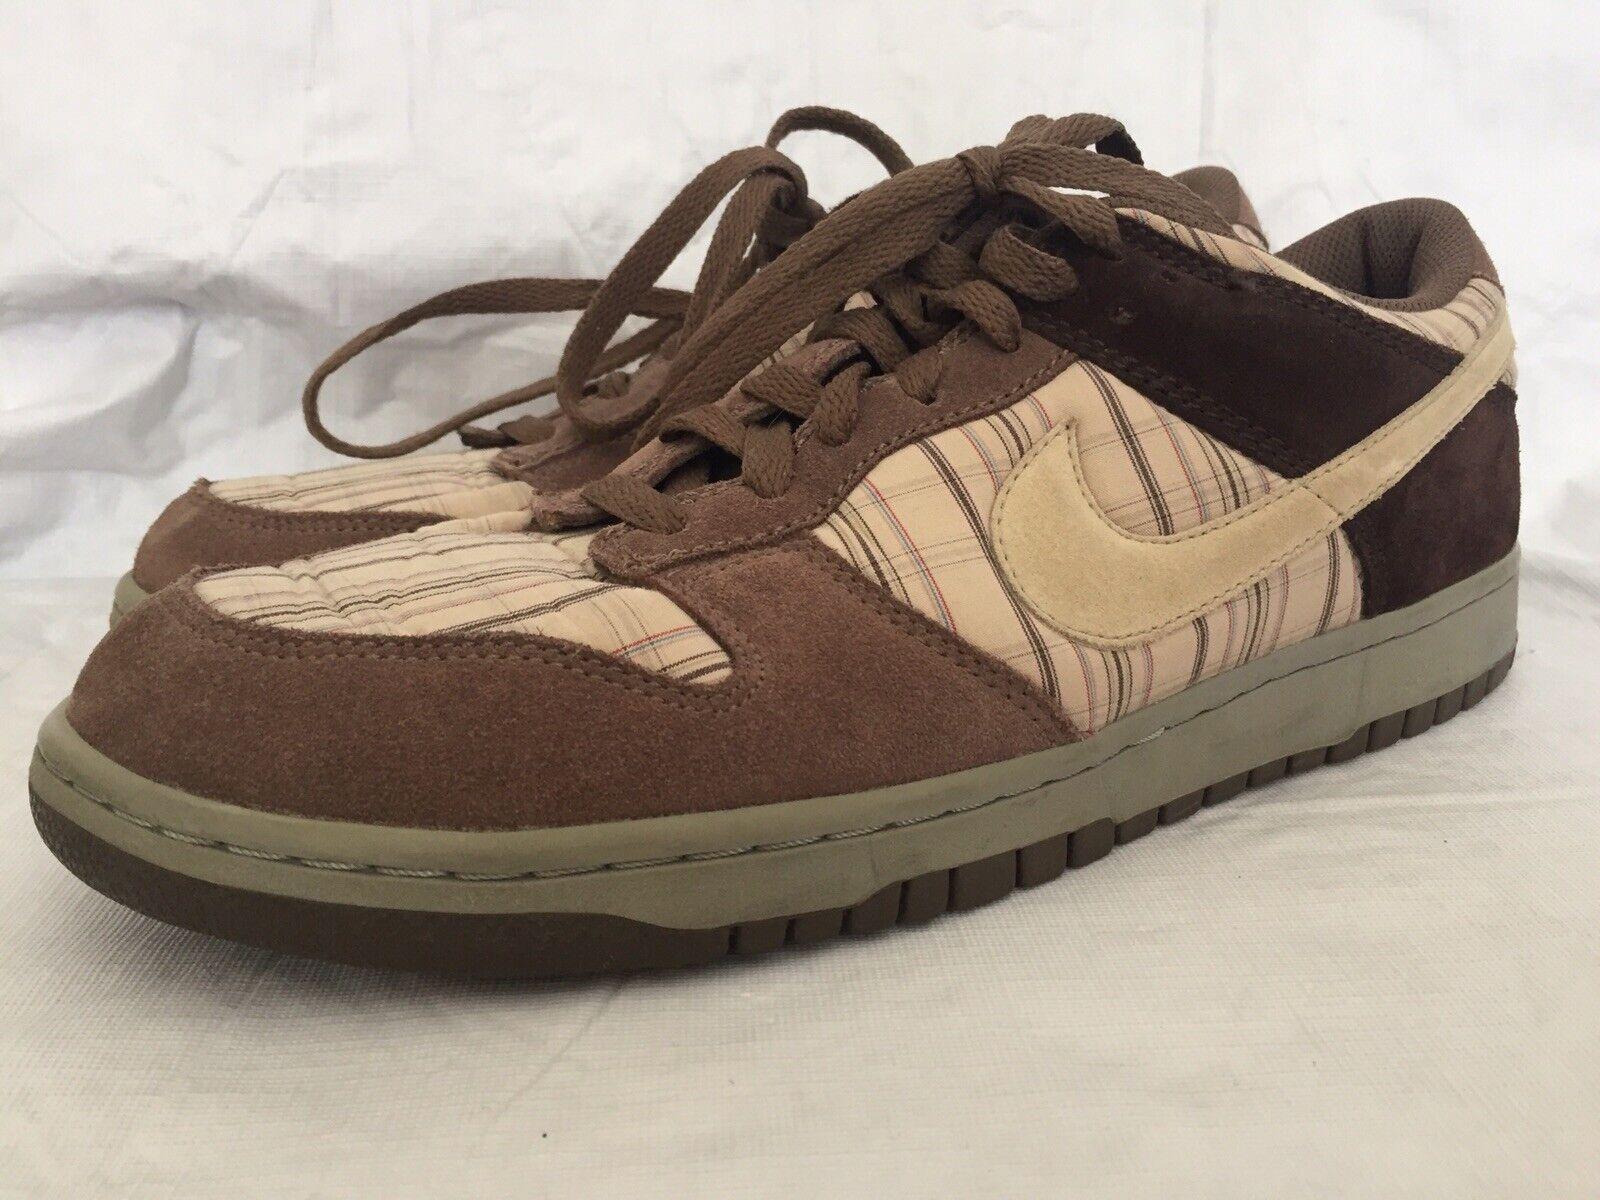 Nike Dunk Low Net Palomino Brown Plaid Men's Size 12 Model 307696 111